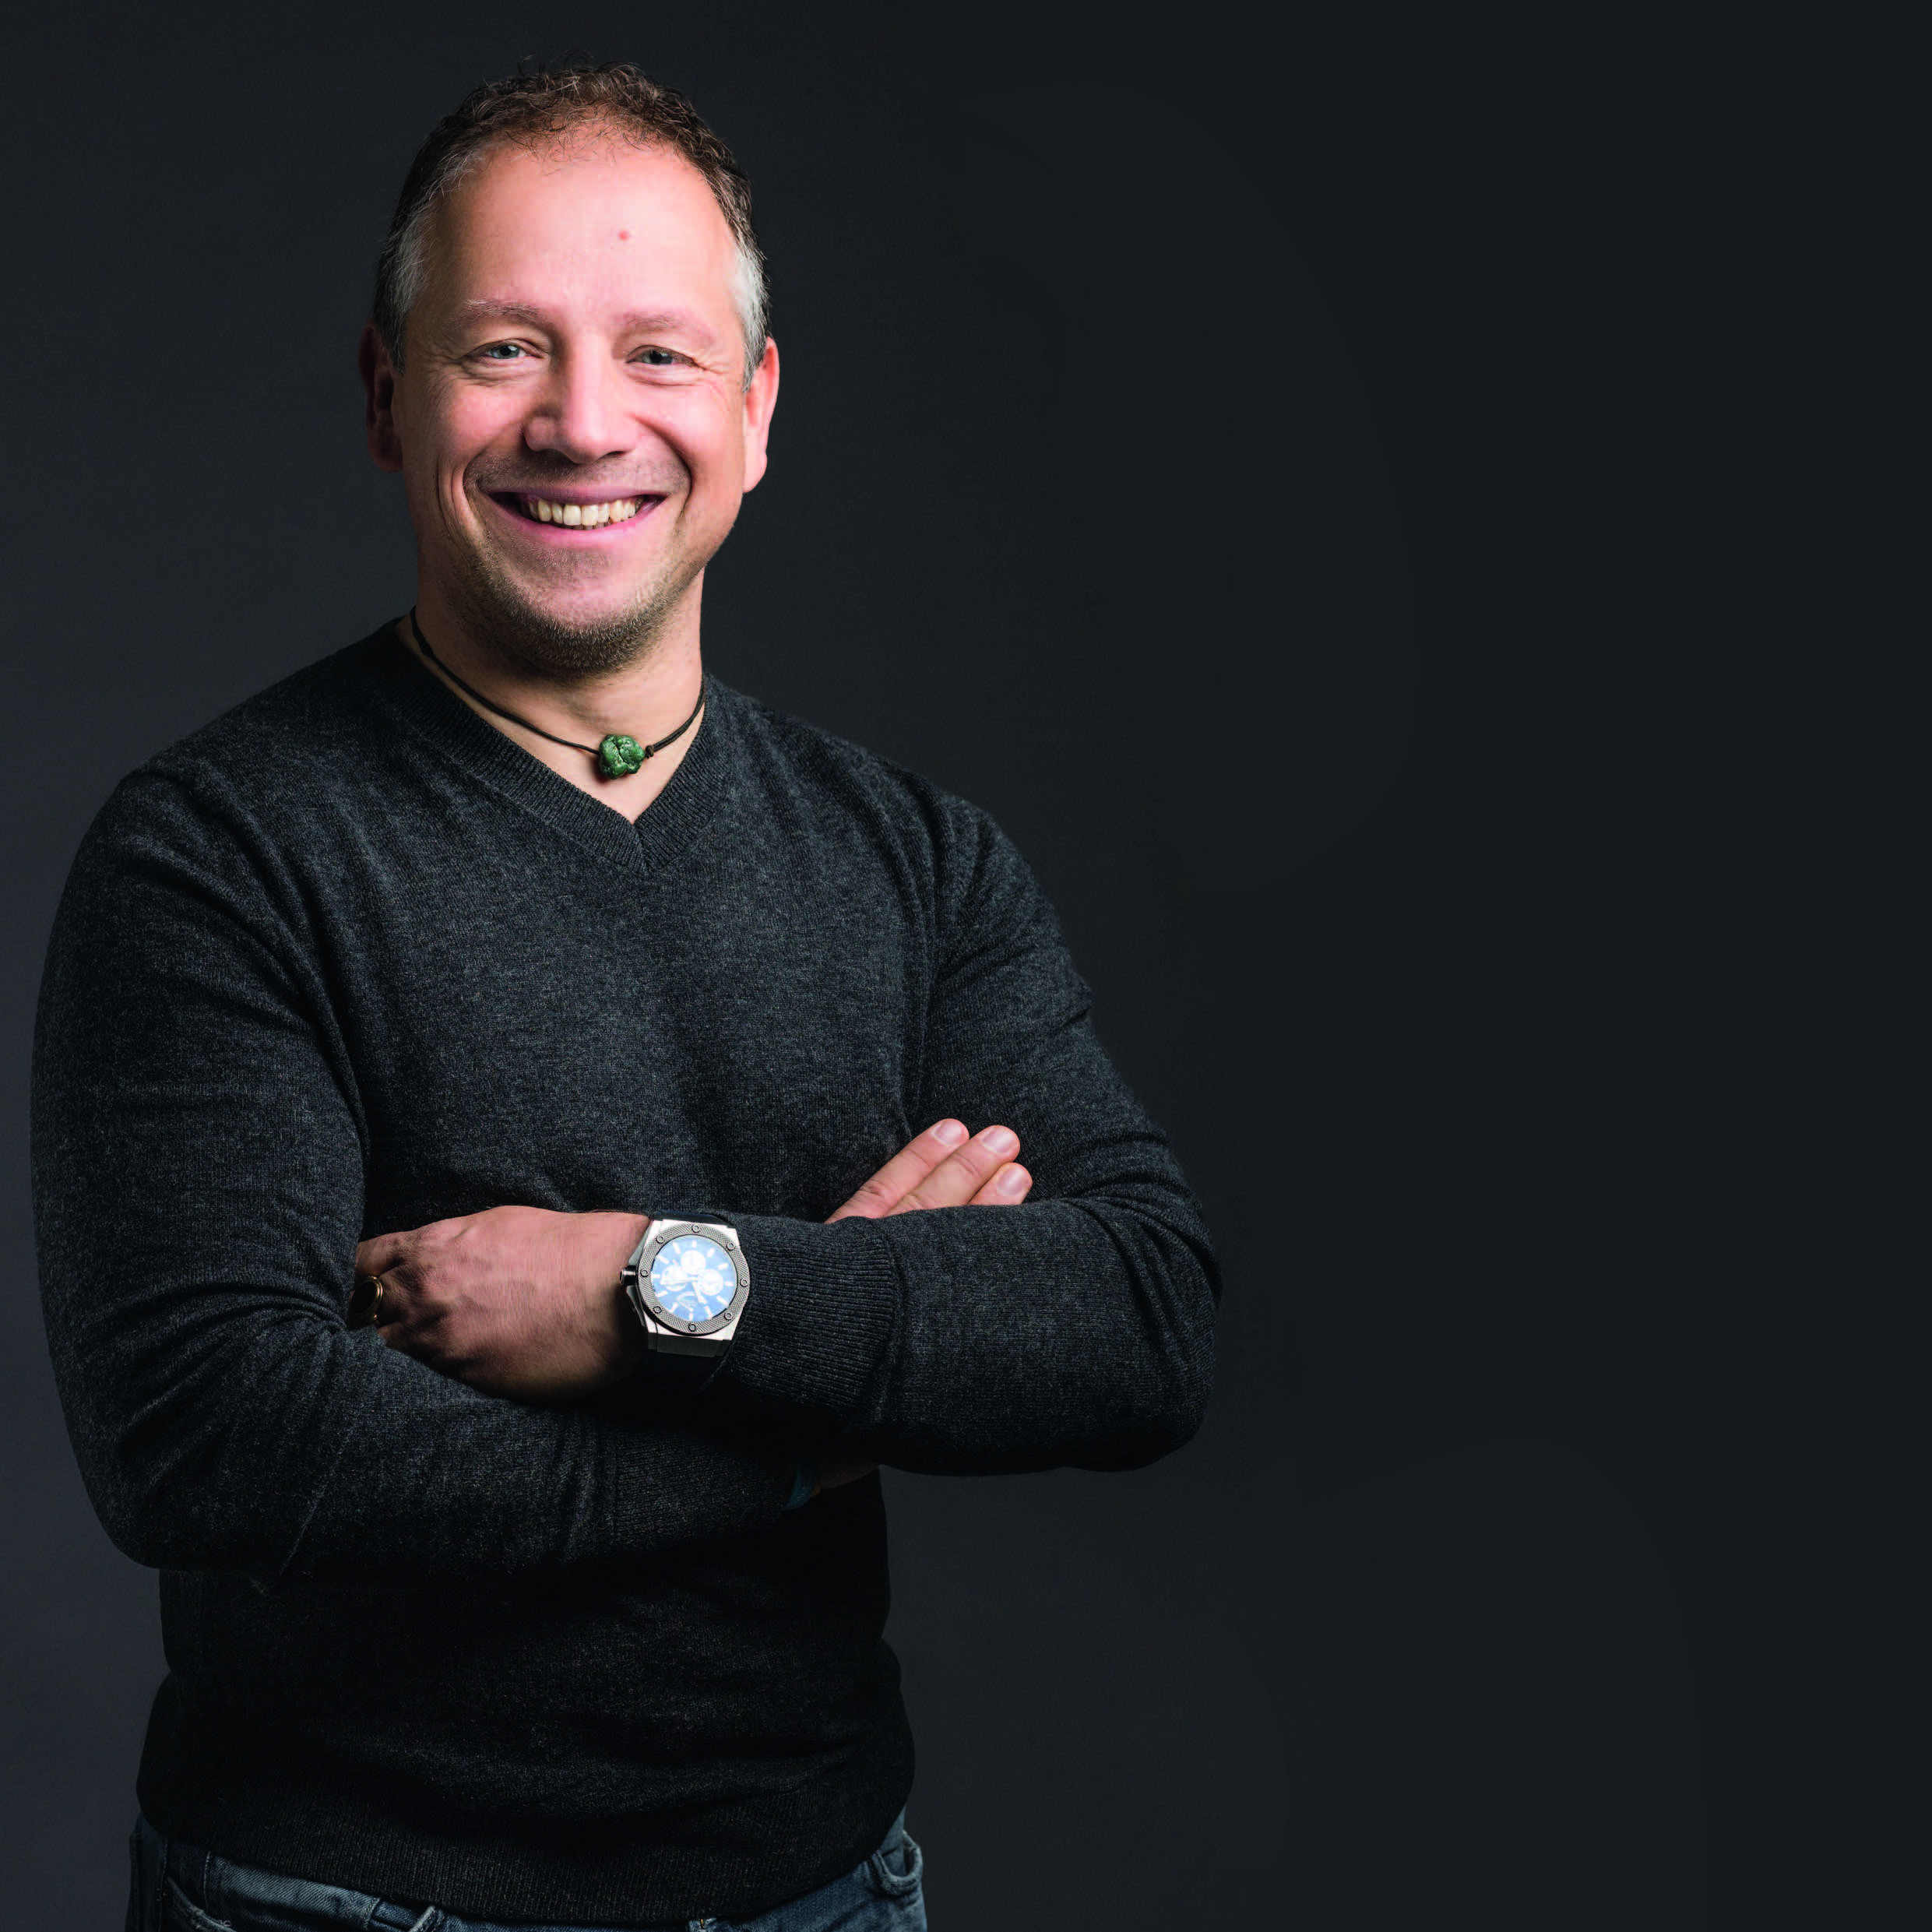 Rudiger Bohm Motivationstrainer Coach Keynote Speaker Buchautor